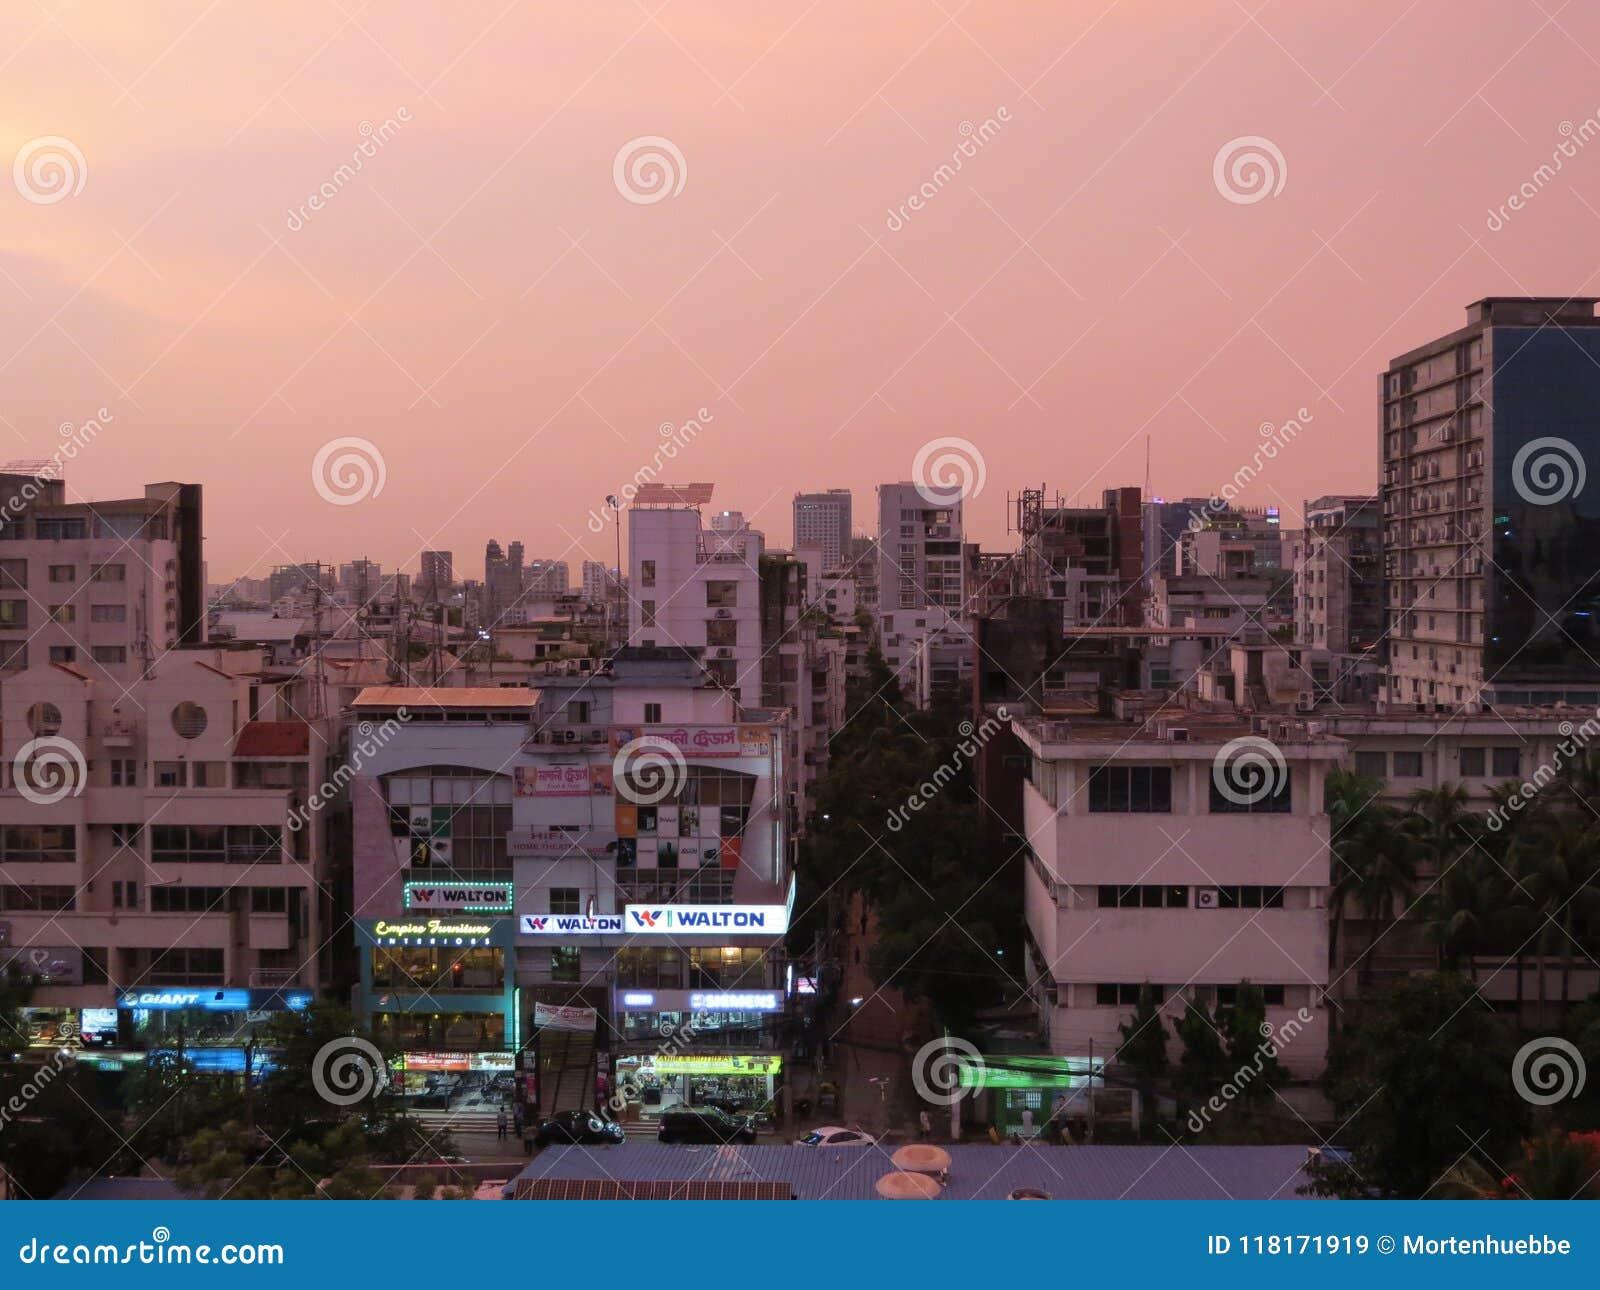 skyscraper and condominiums in Dhaka, Bangladesh